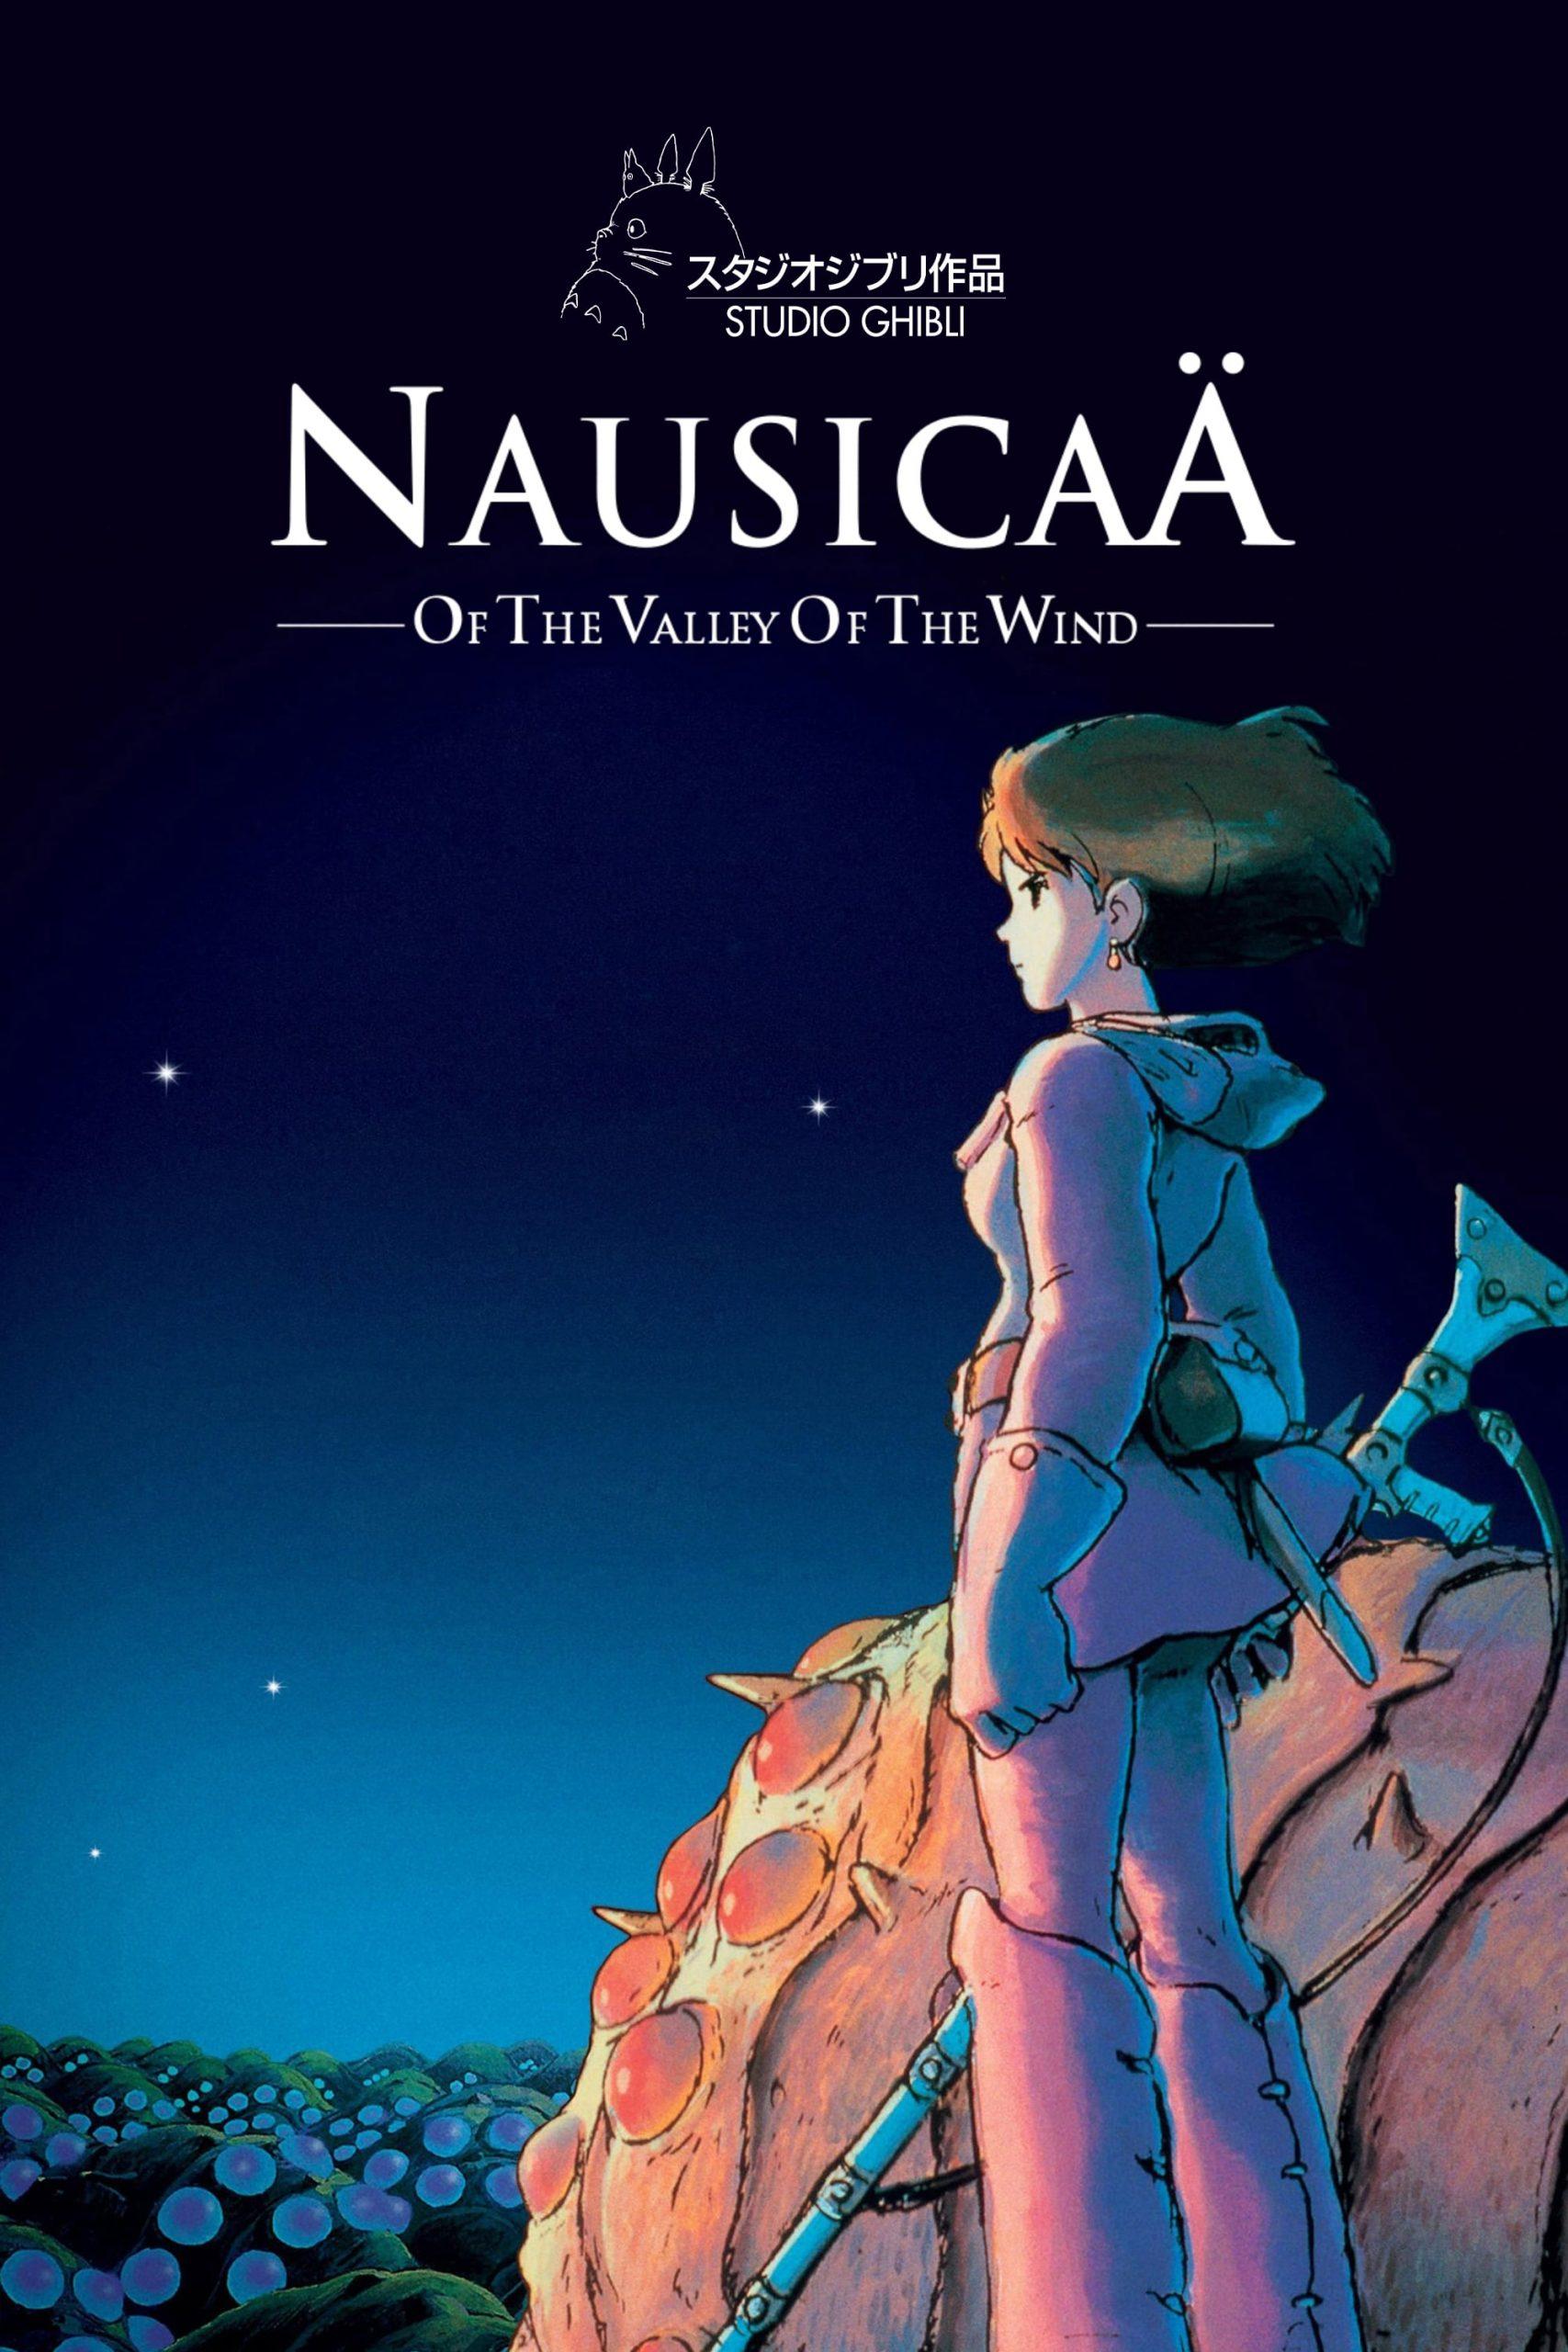 دانلود انیمیشن Nausicaa of the Valley of the Wind 1984 با دوبله فارسی